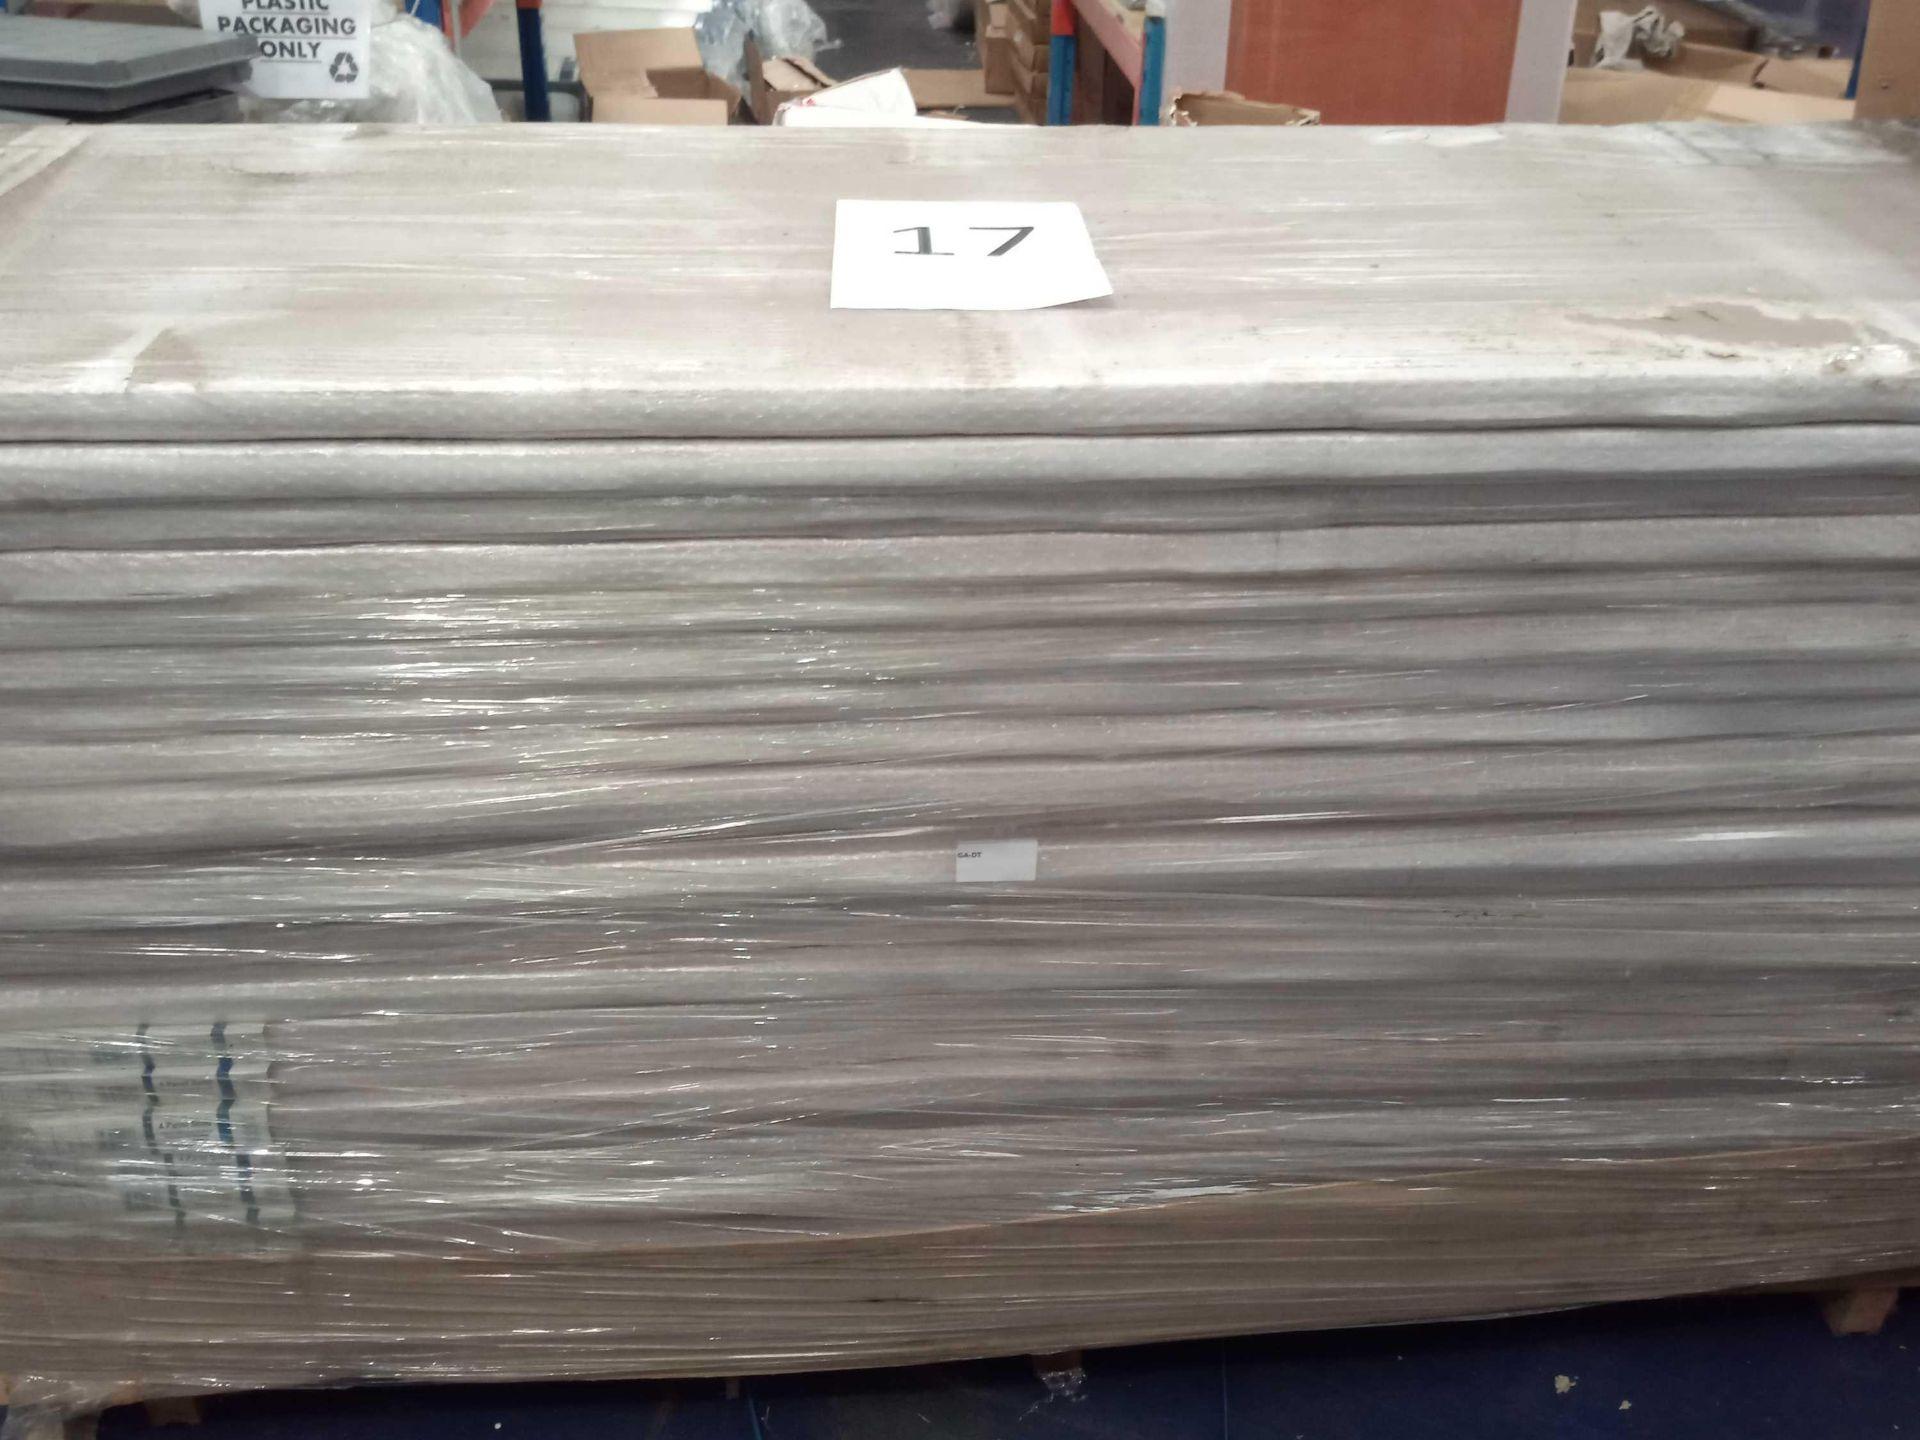 Rrp £4200 Brand New 4 Panel Solid Cherry Hardwood Doors - Image 3 of 3